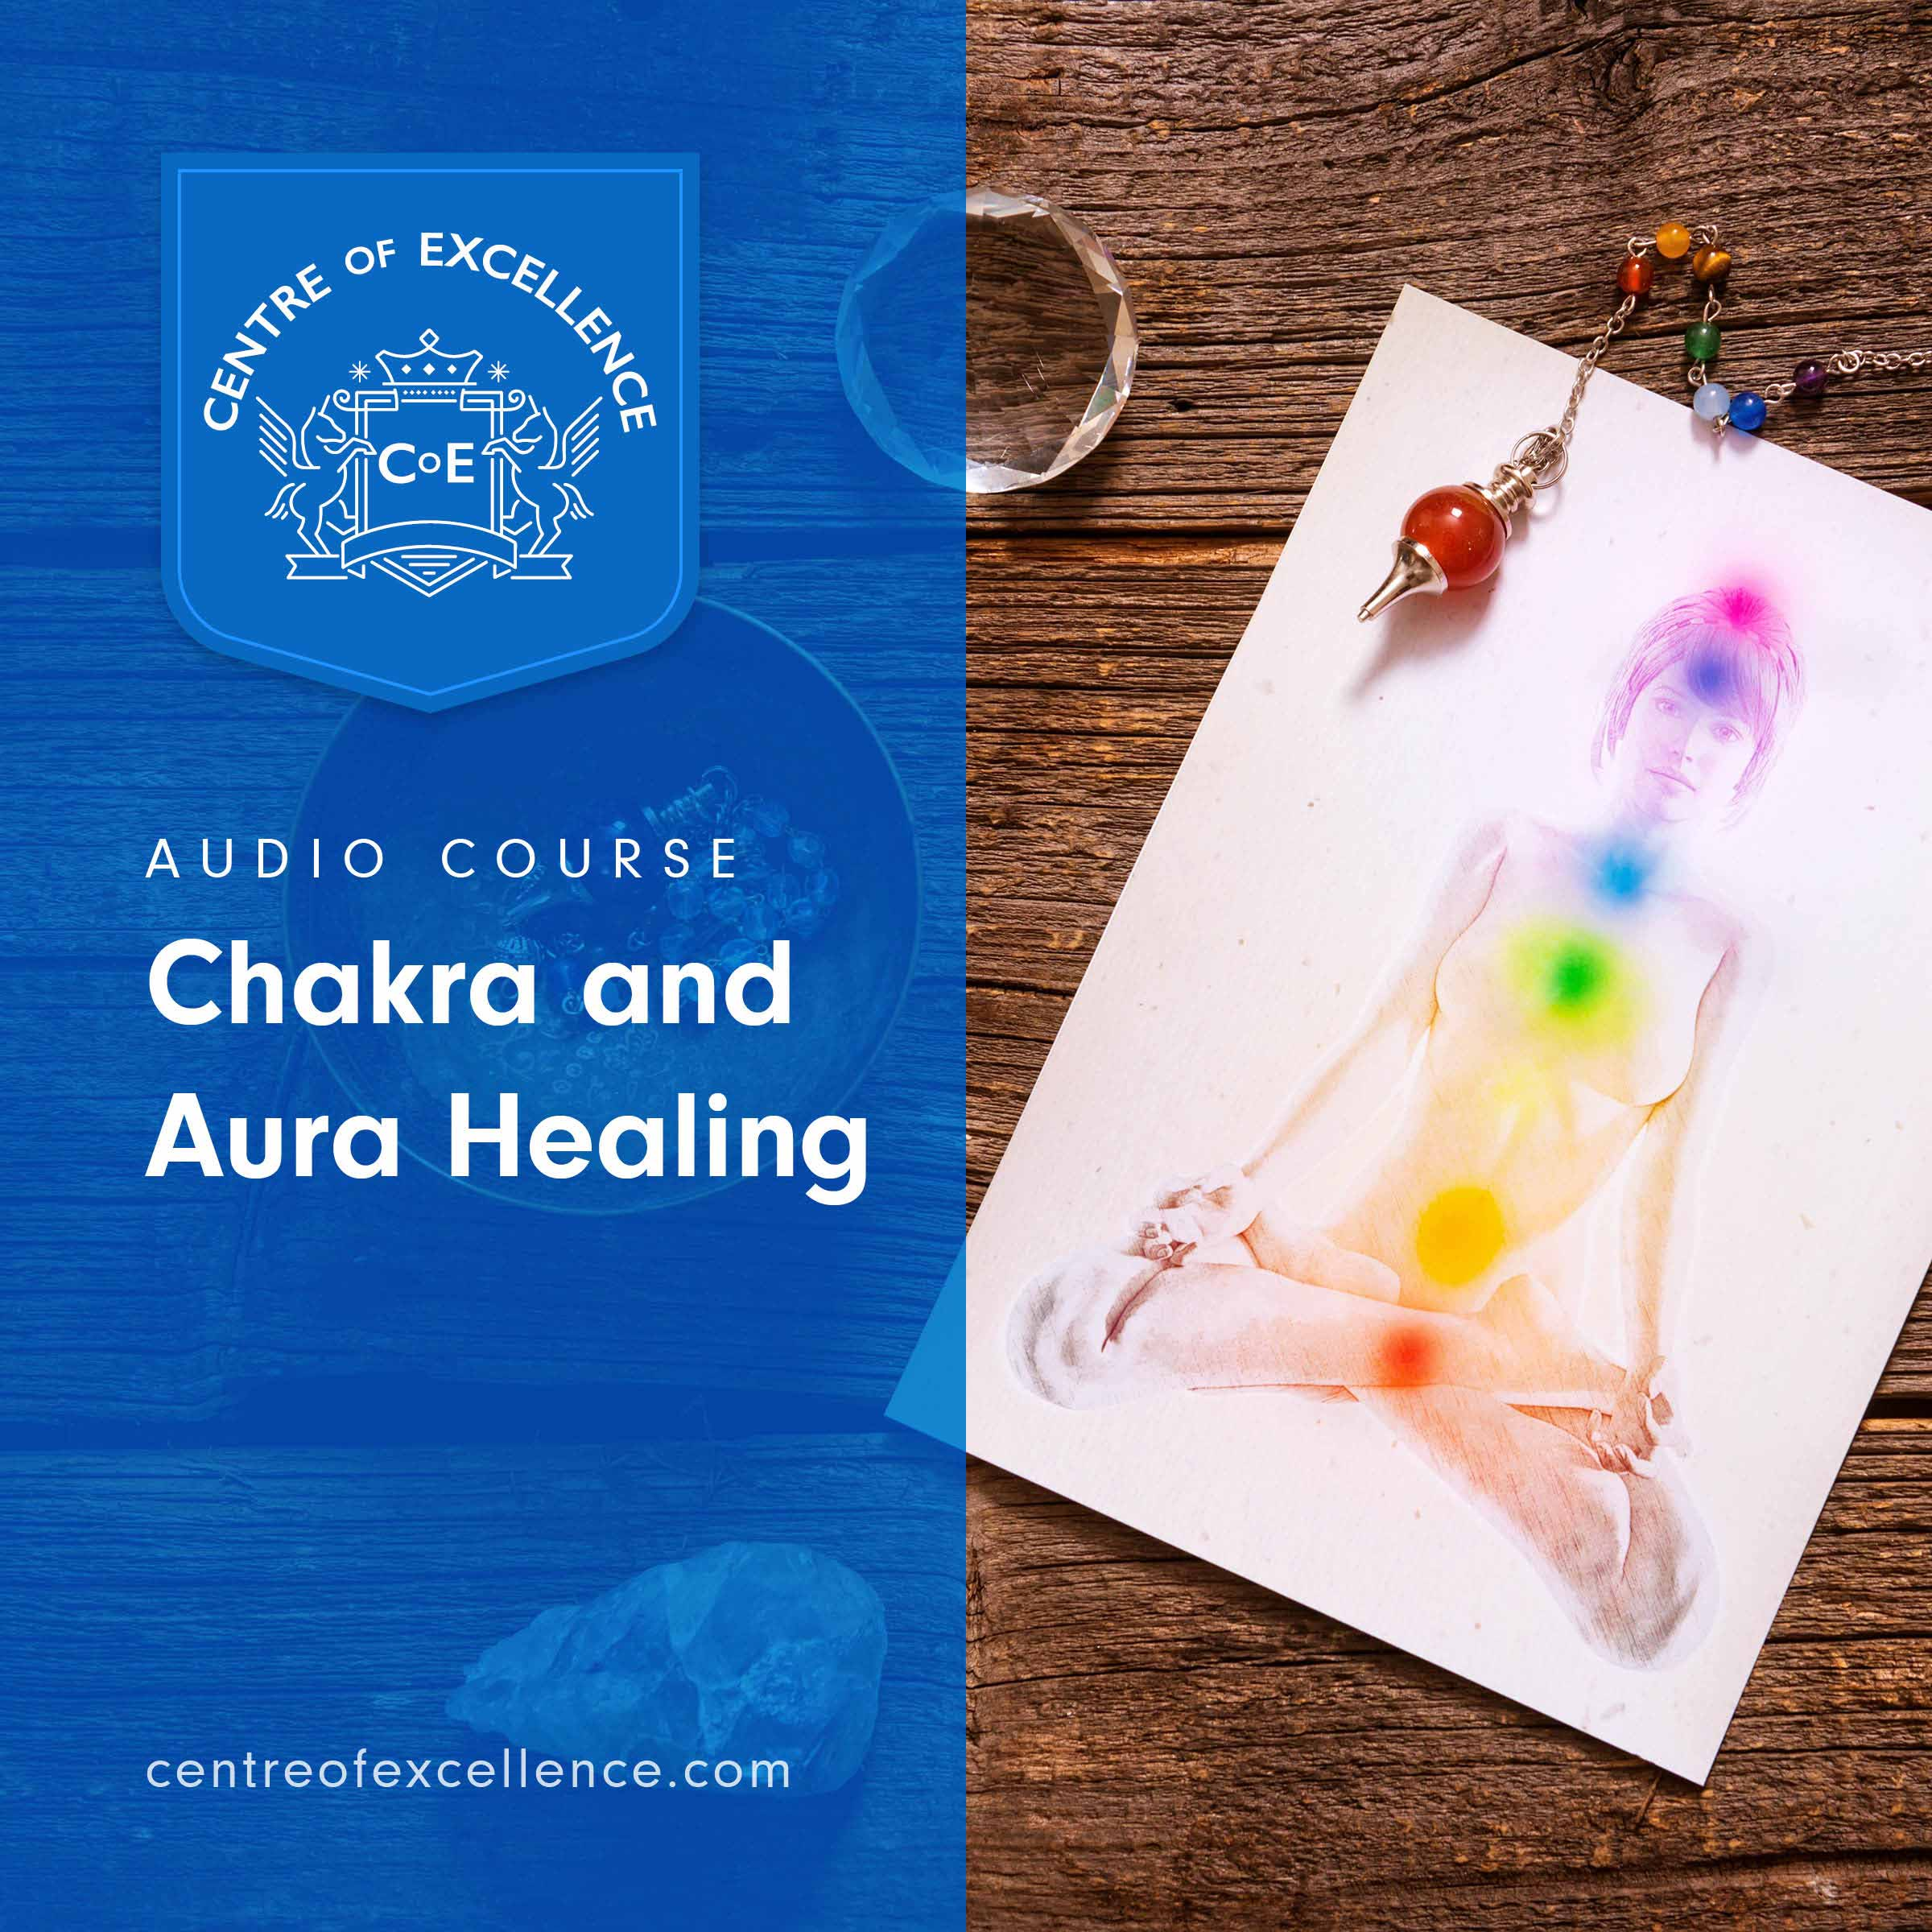 Chakra and Aura Healing Audio Course